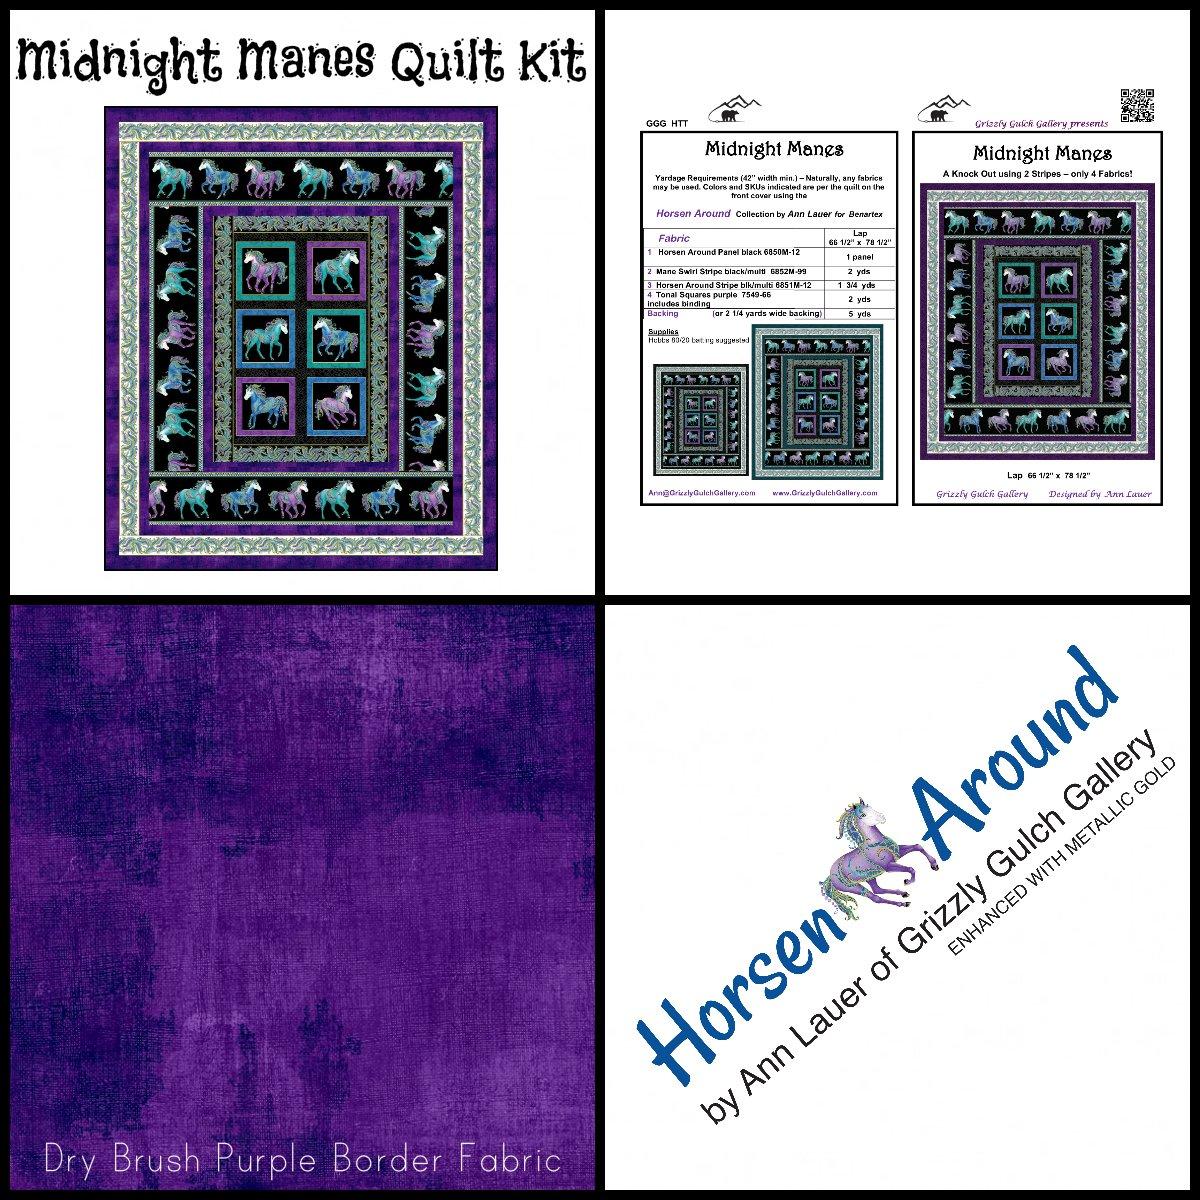 Midnight Manes Panel Quilt Kit (66.5 x 78.5)